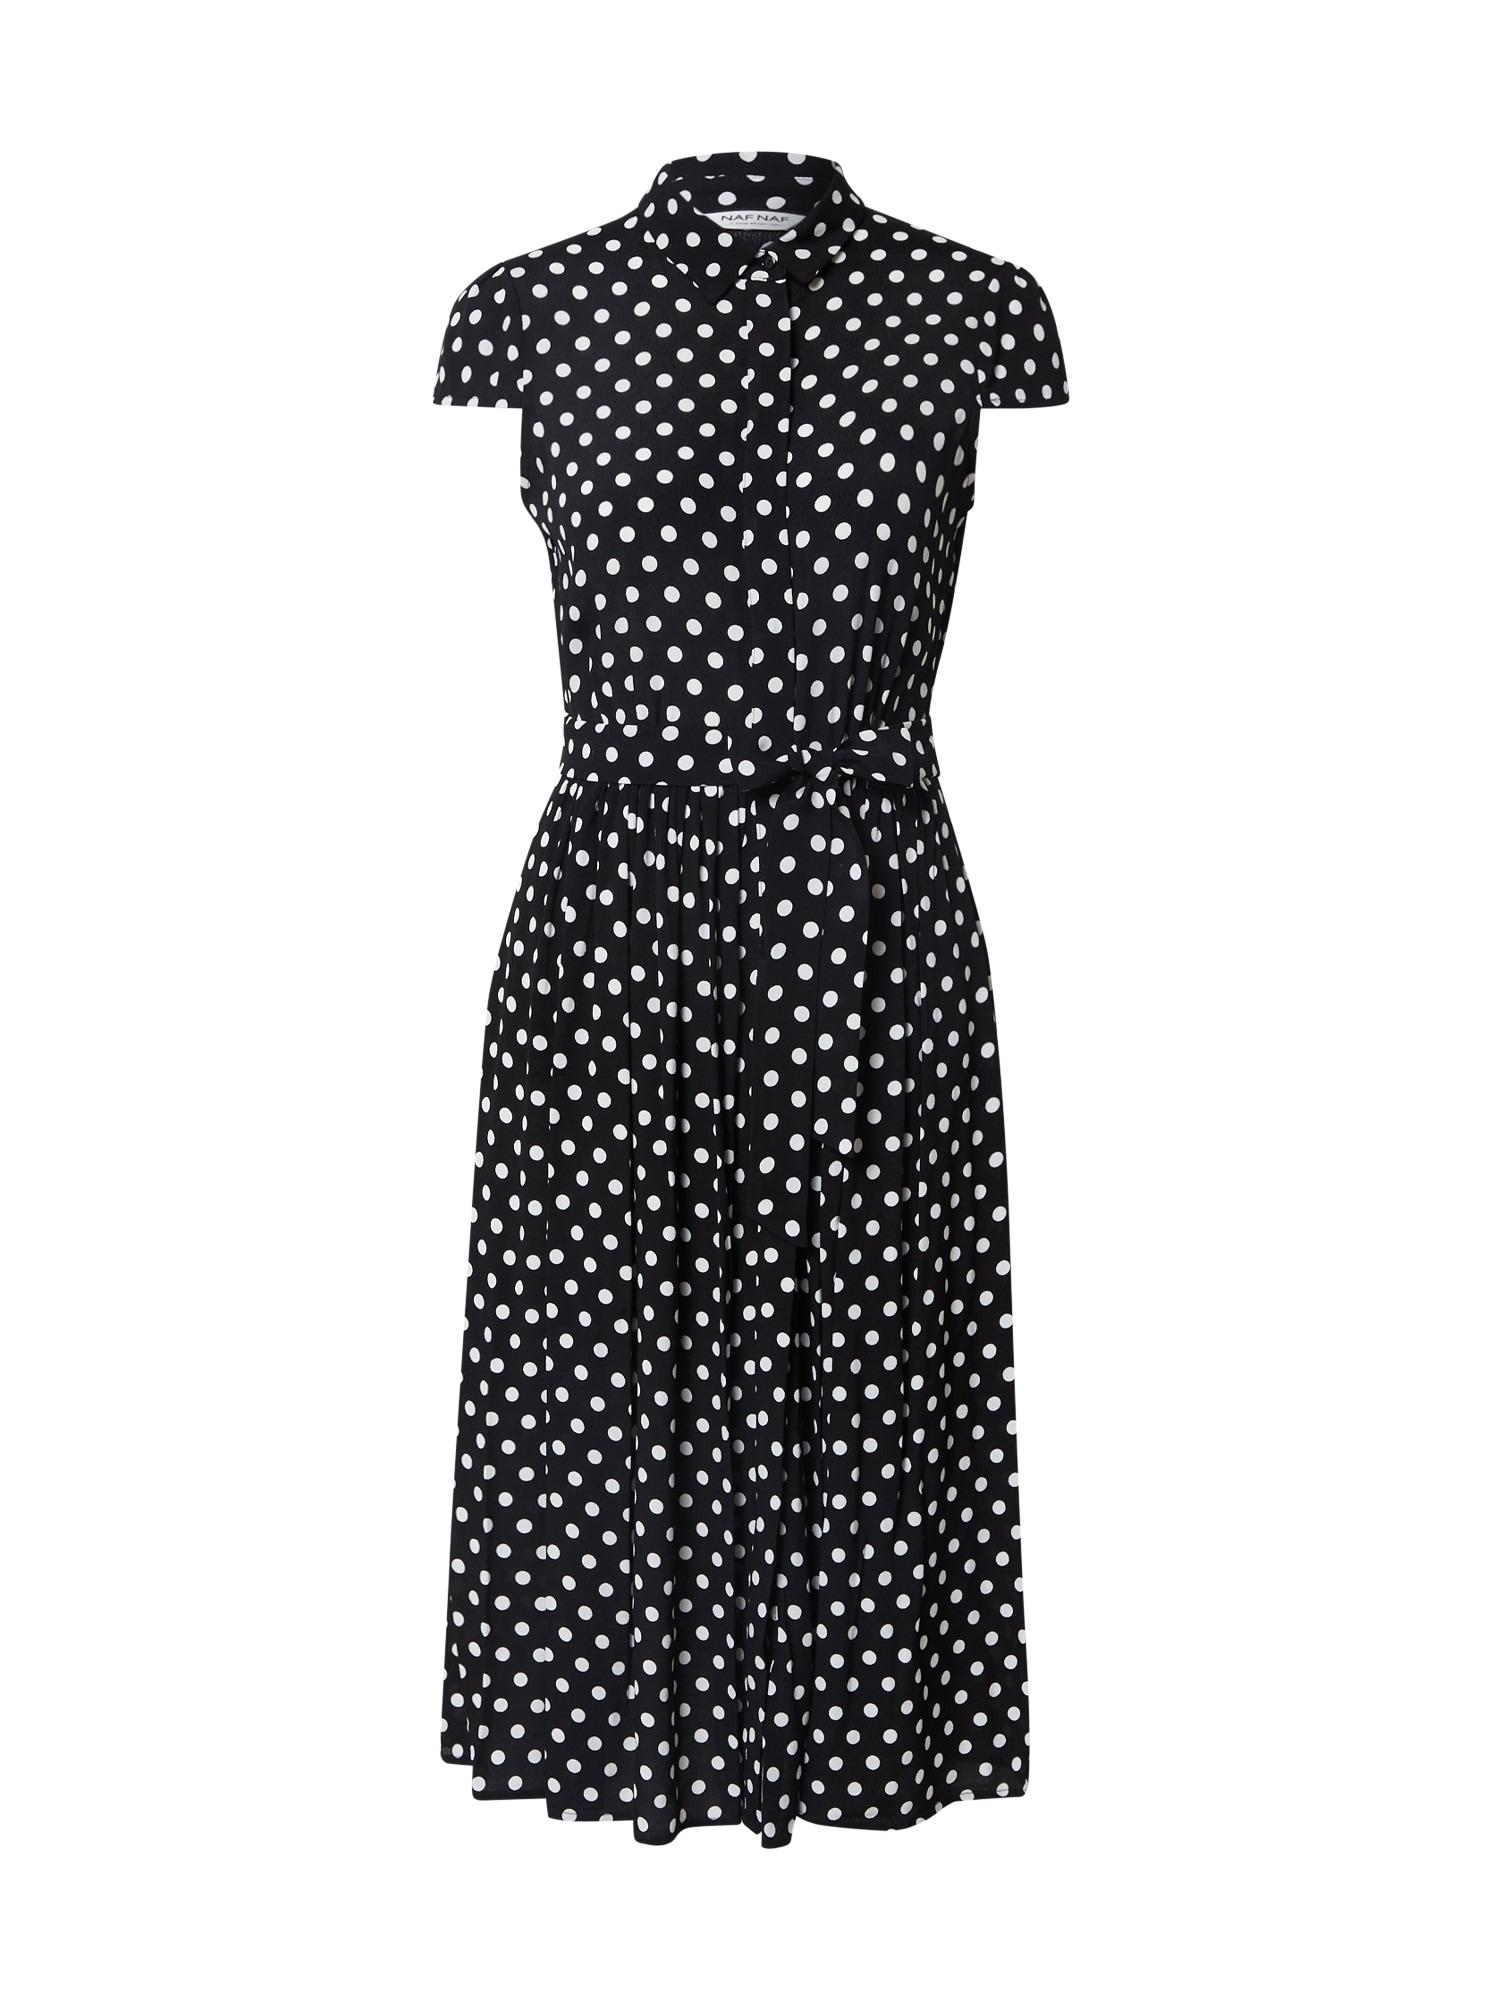 NAF NAF Palaidinės tipo suknelė